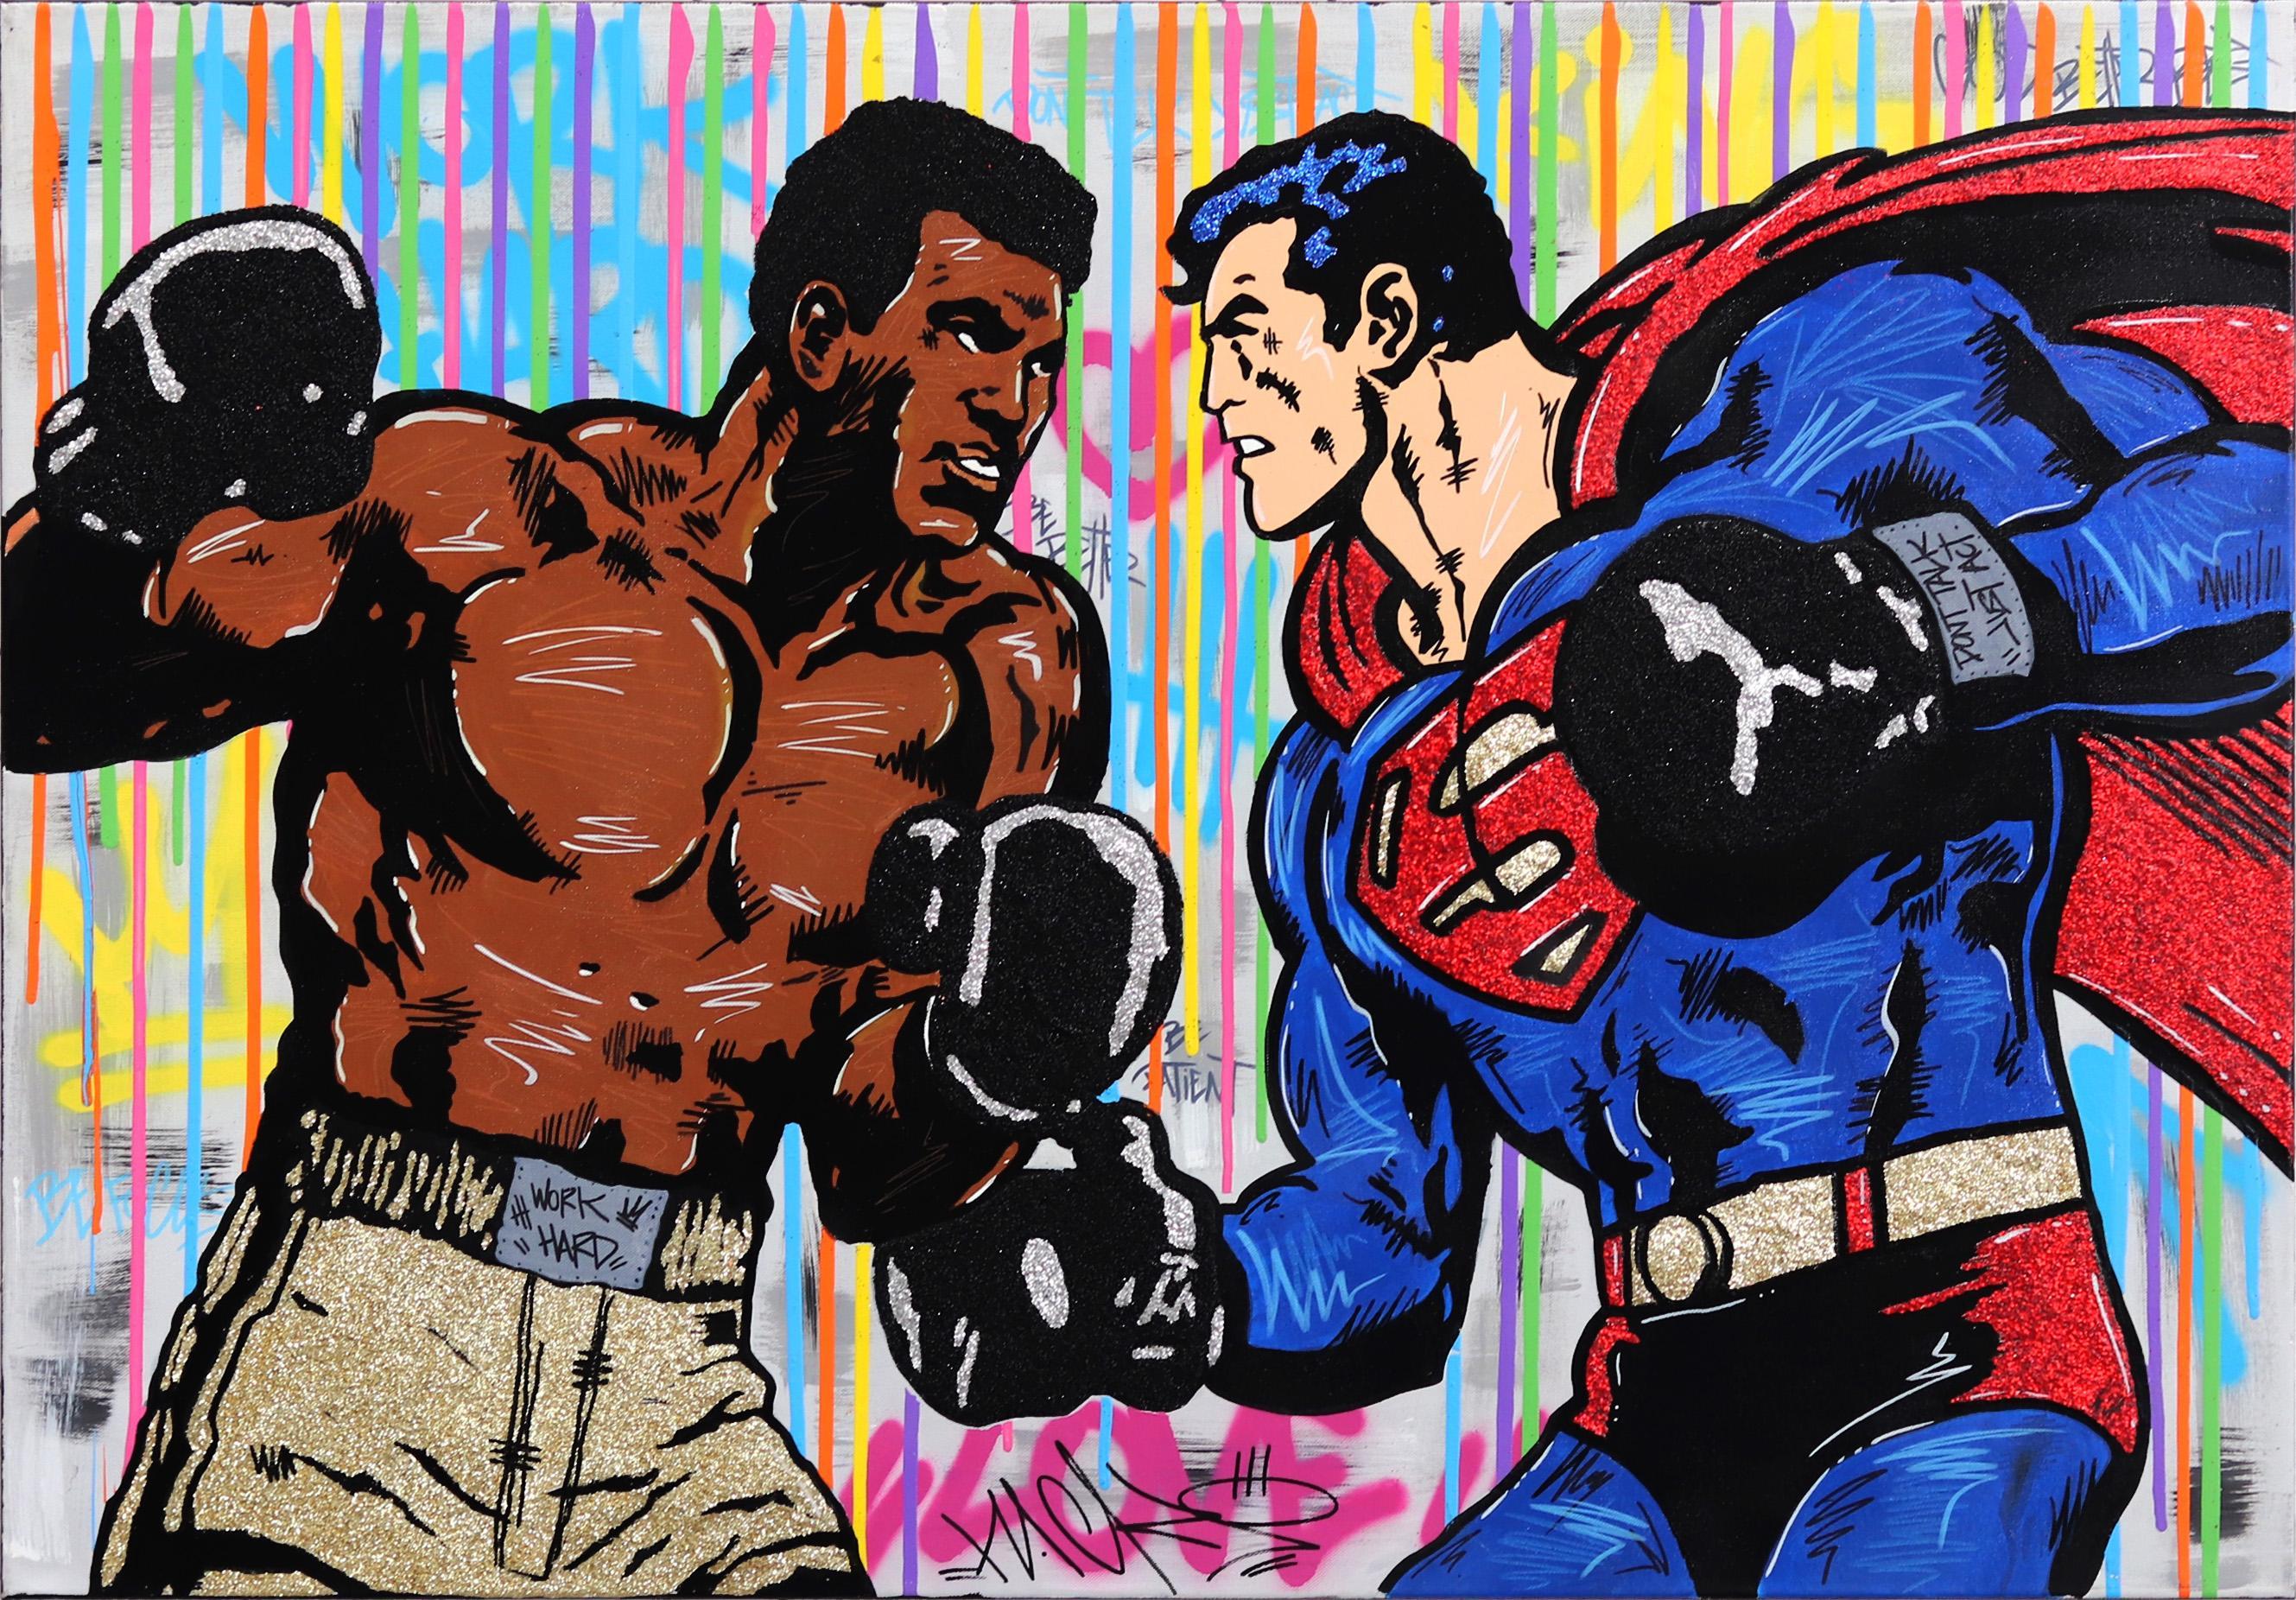 Clash of Heroes - Original Pop Art Painting